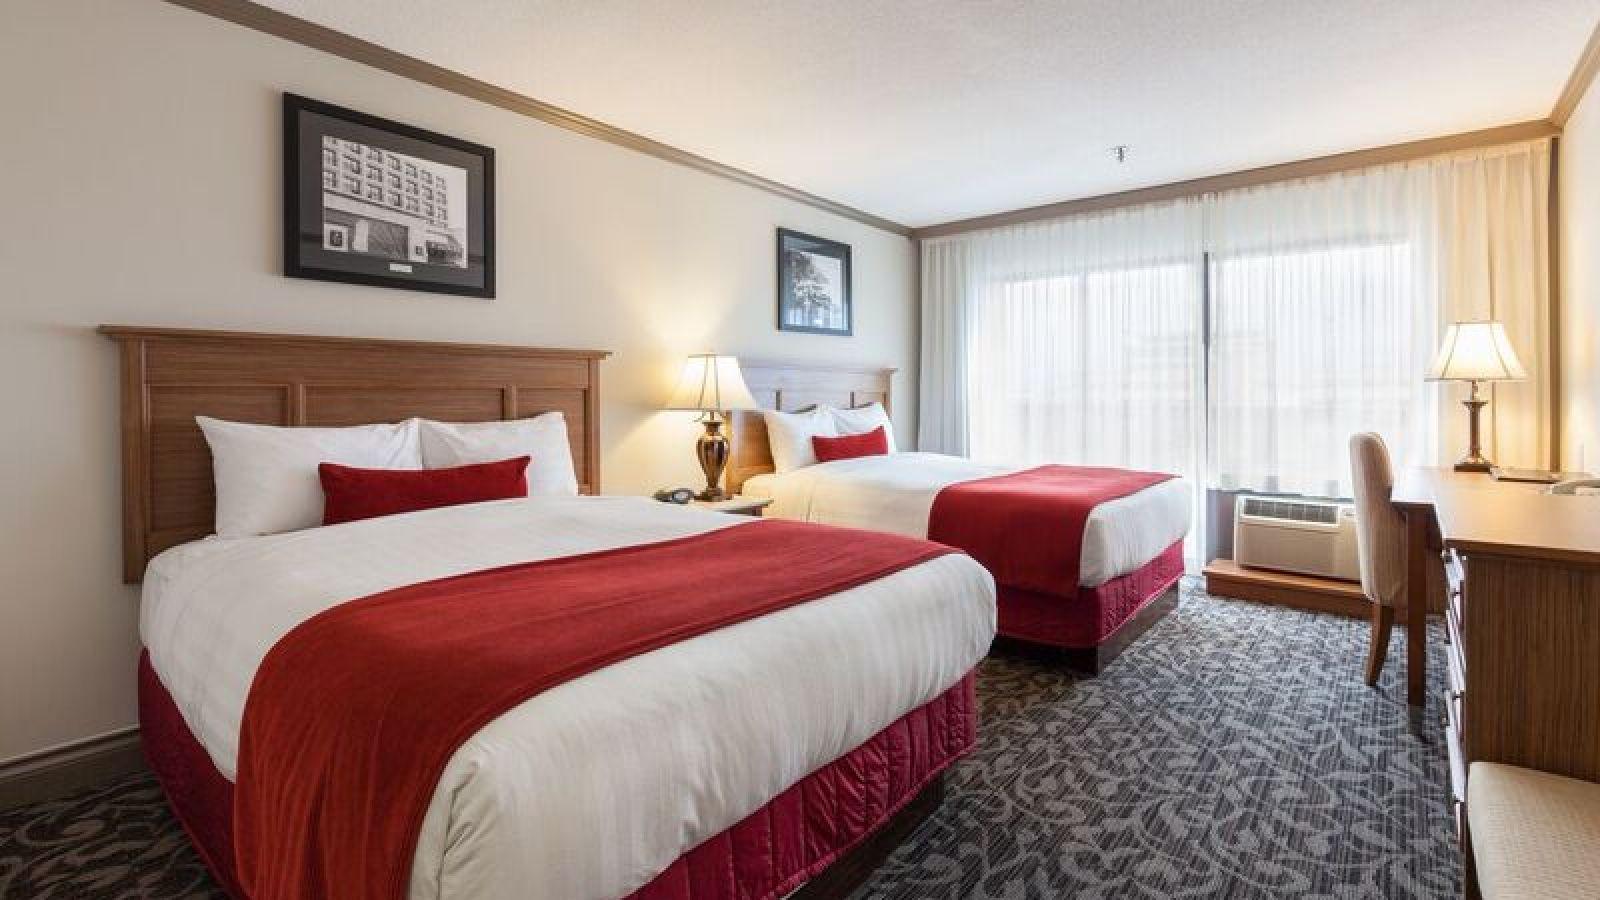 Royal Anne Hotel Kelowna - standard queen/queen